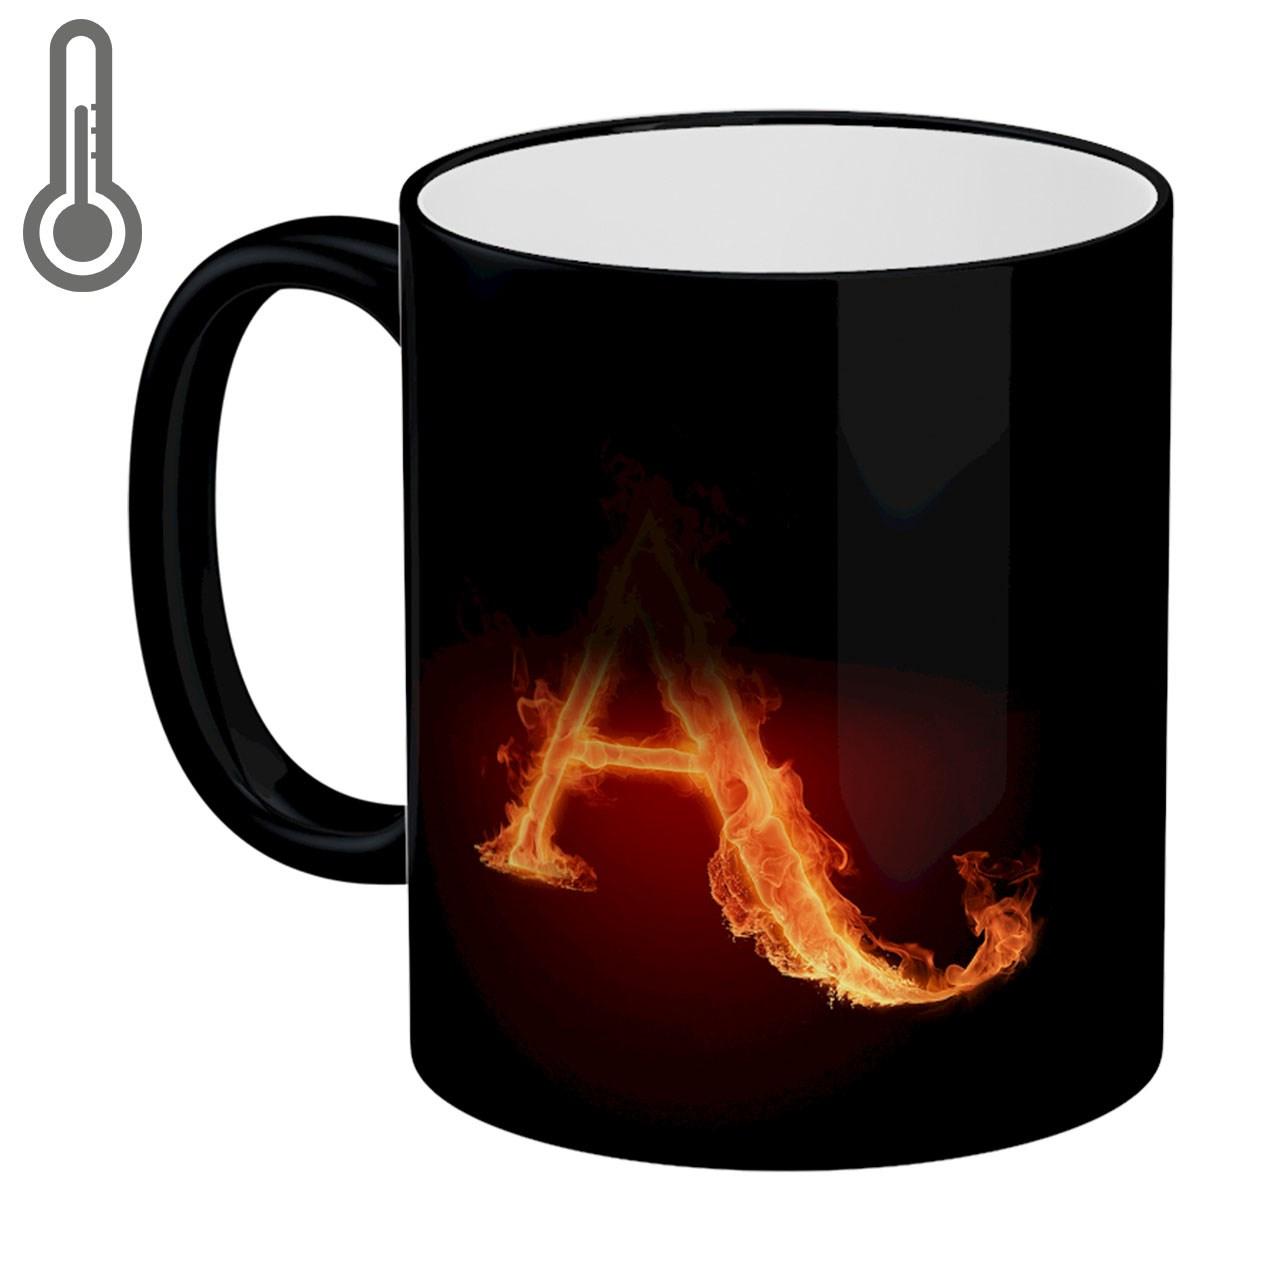 ماگ حرارتی لومانا طرح A  کد MAG0602